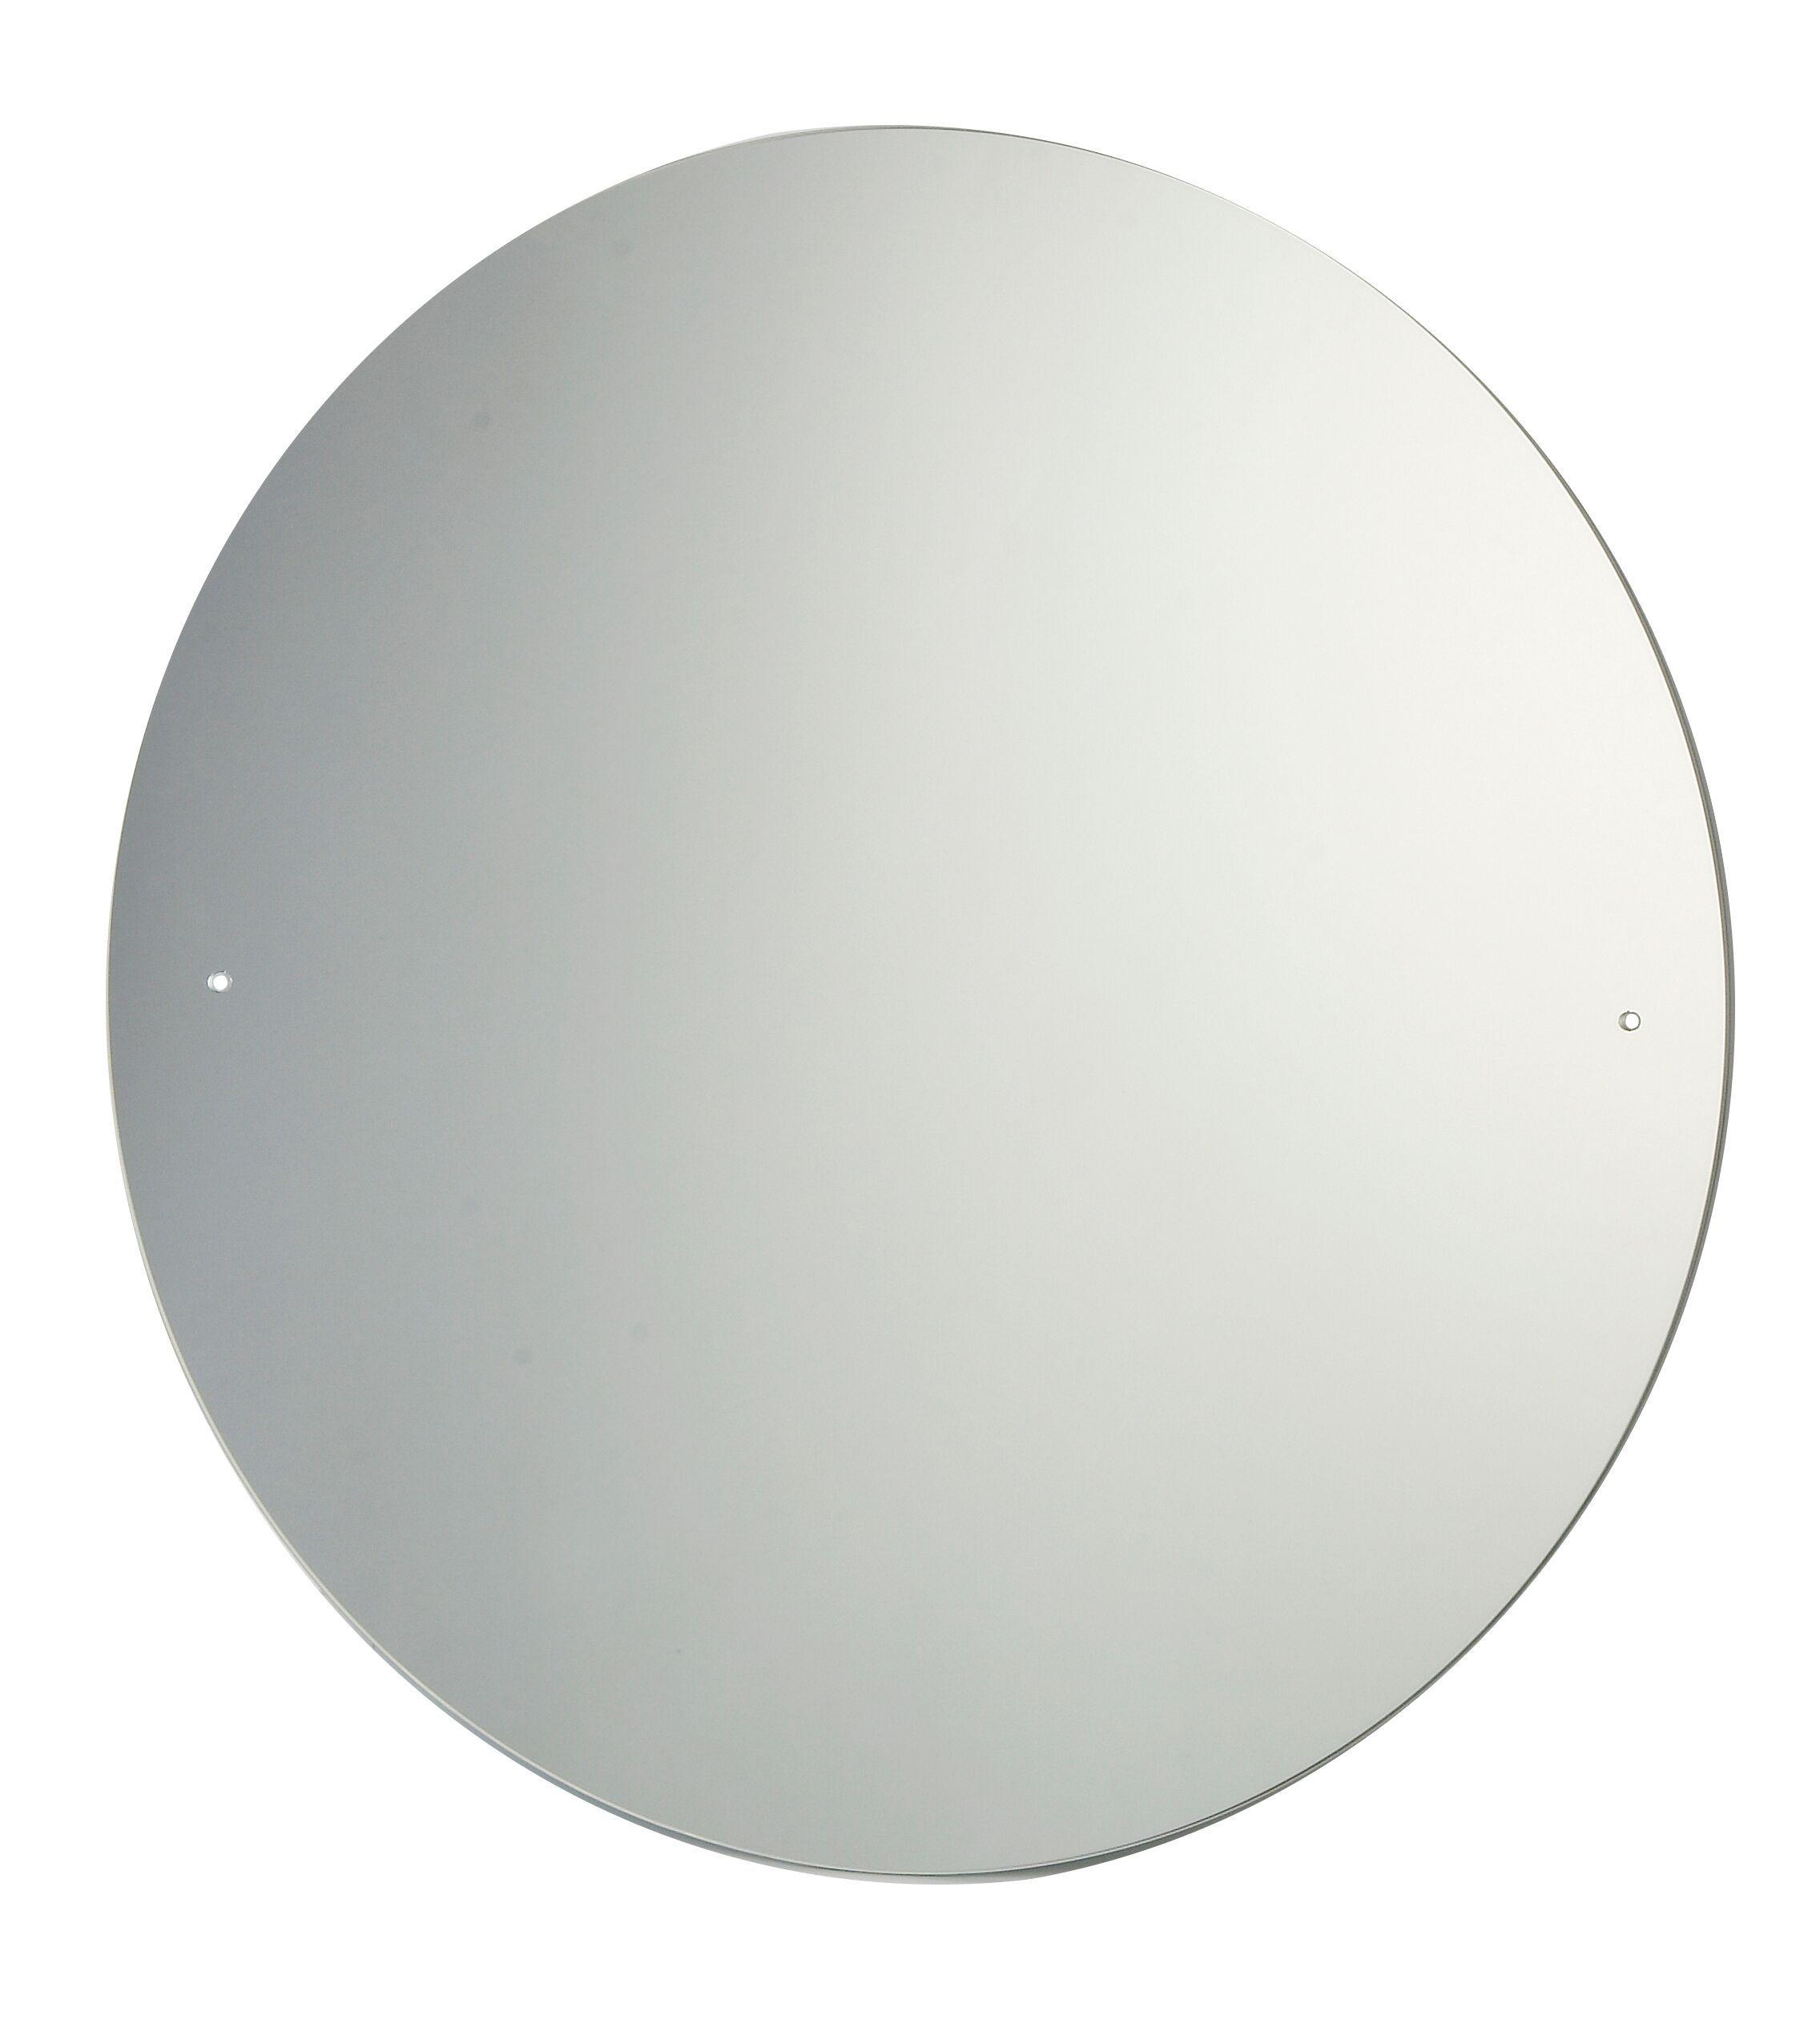 Unframed Circle Mirror (H)600mm (W) 600mm | Departments | DIY at B&Q ...